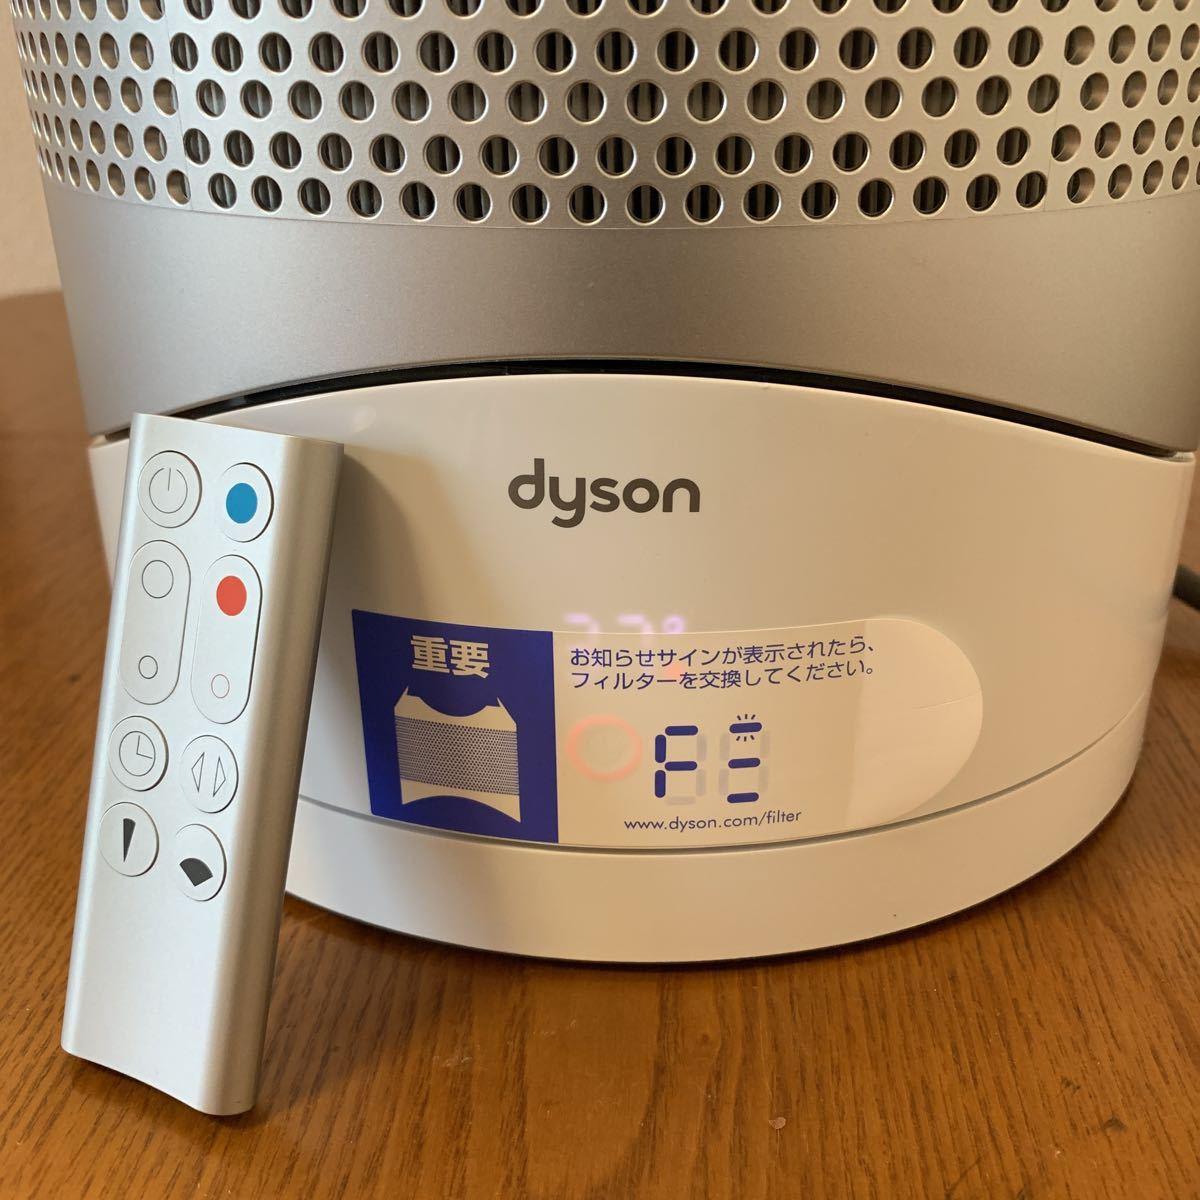 *dyson ダイソン HP01 空気洗浄機能付ファンヒーター ホワイト 2016年製 動作確認済 リモコン付。_画像2